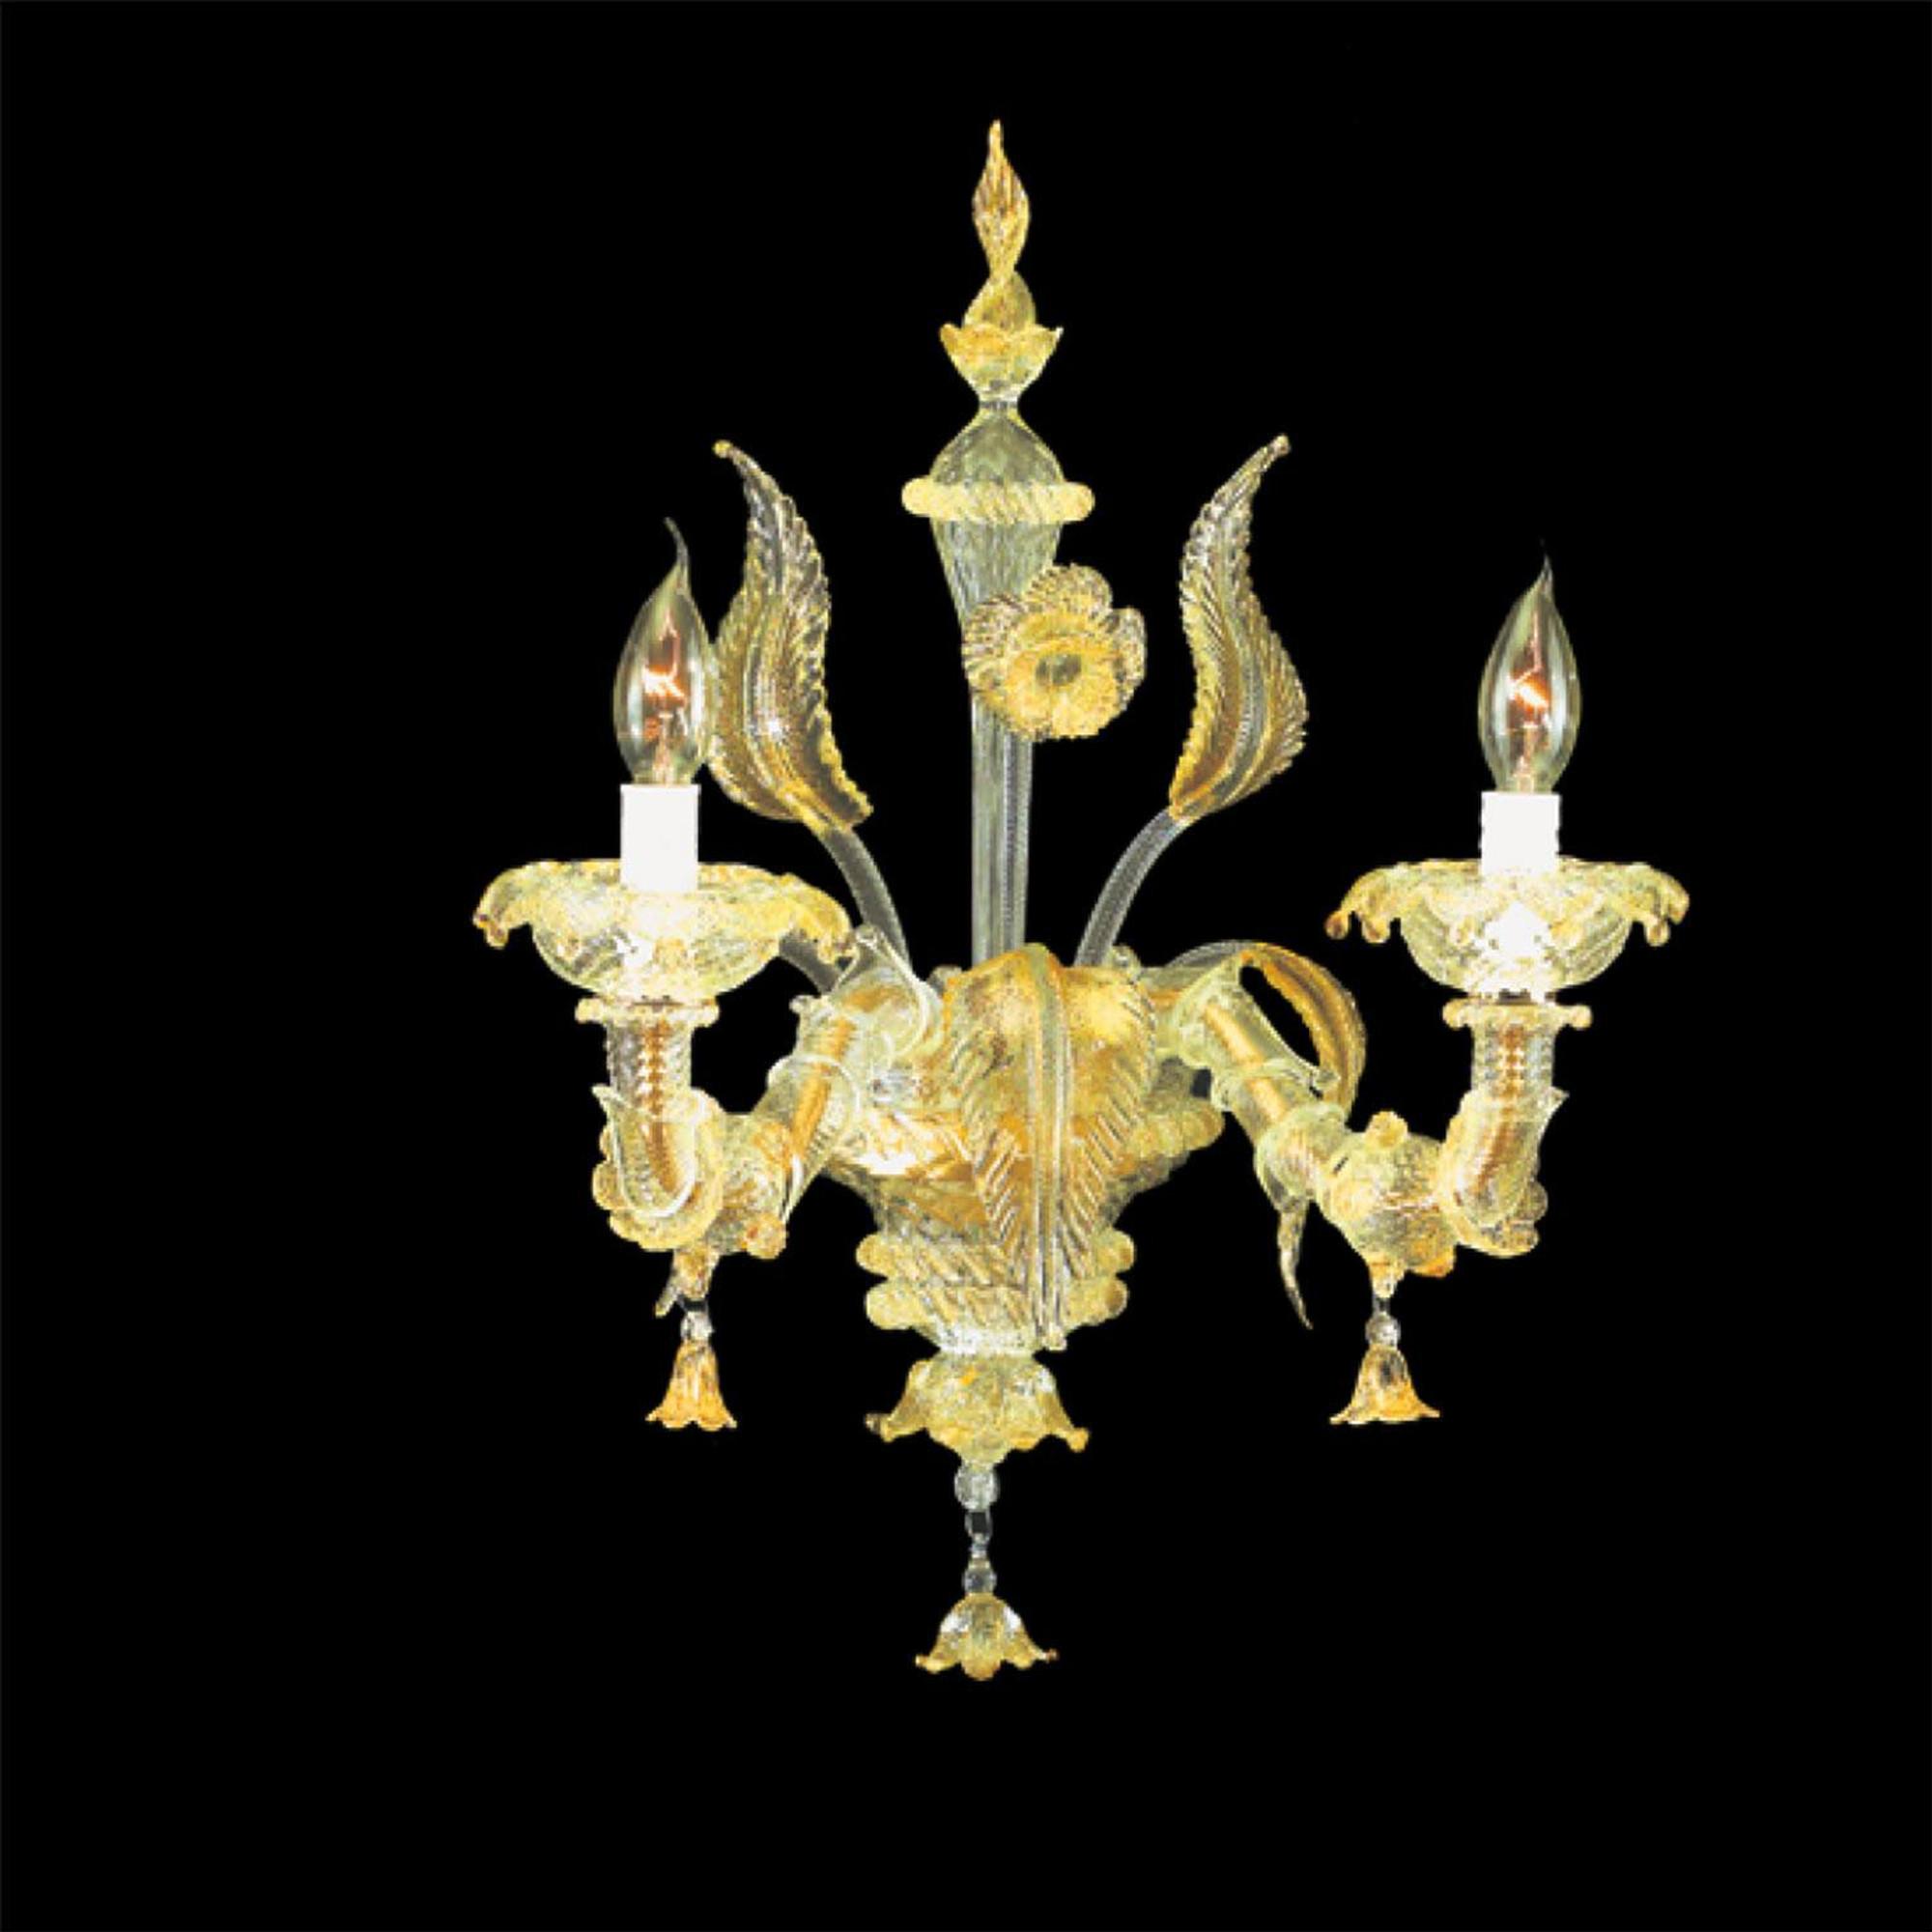 artedimurano exclusive wandleuchte exklusive lampen aus europa online kaufen pinlight. Black Bedroom Furniture Sets. Home Design Ideas